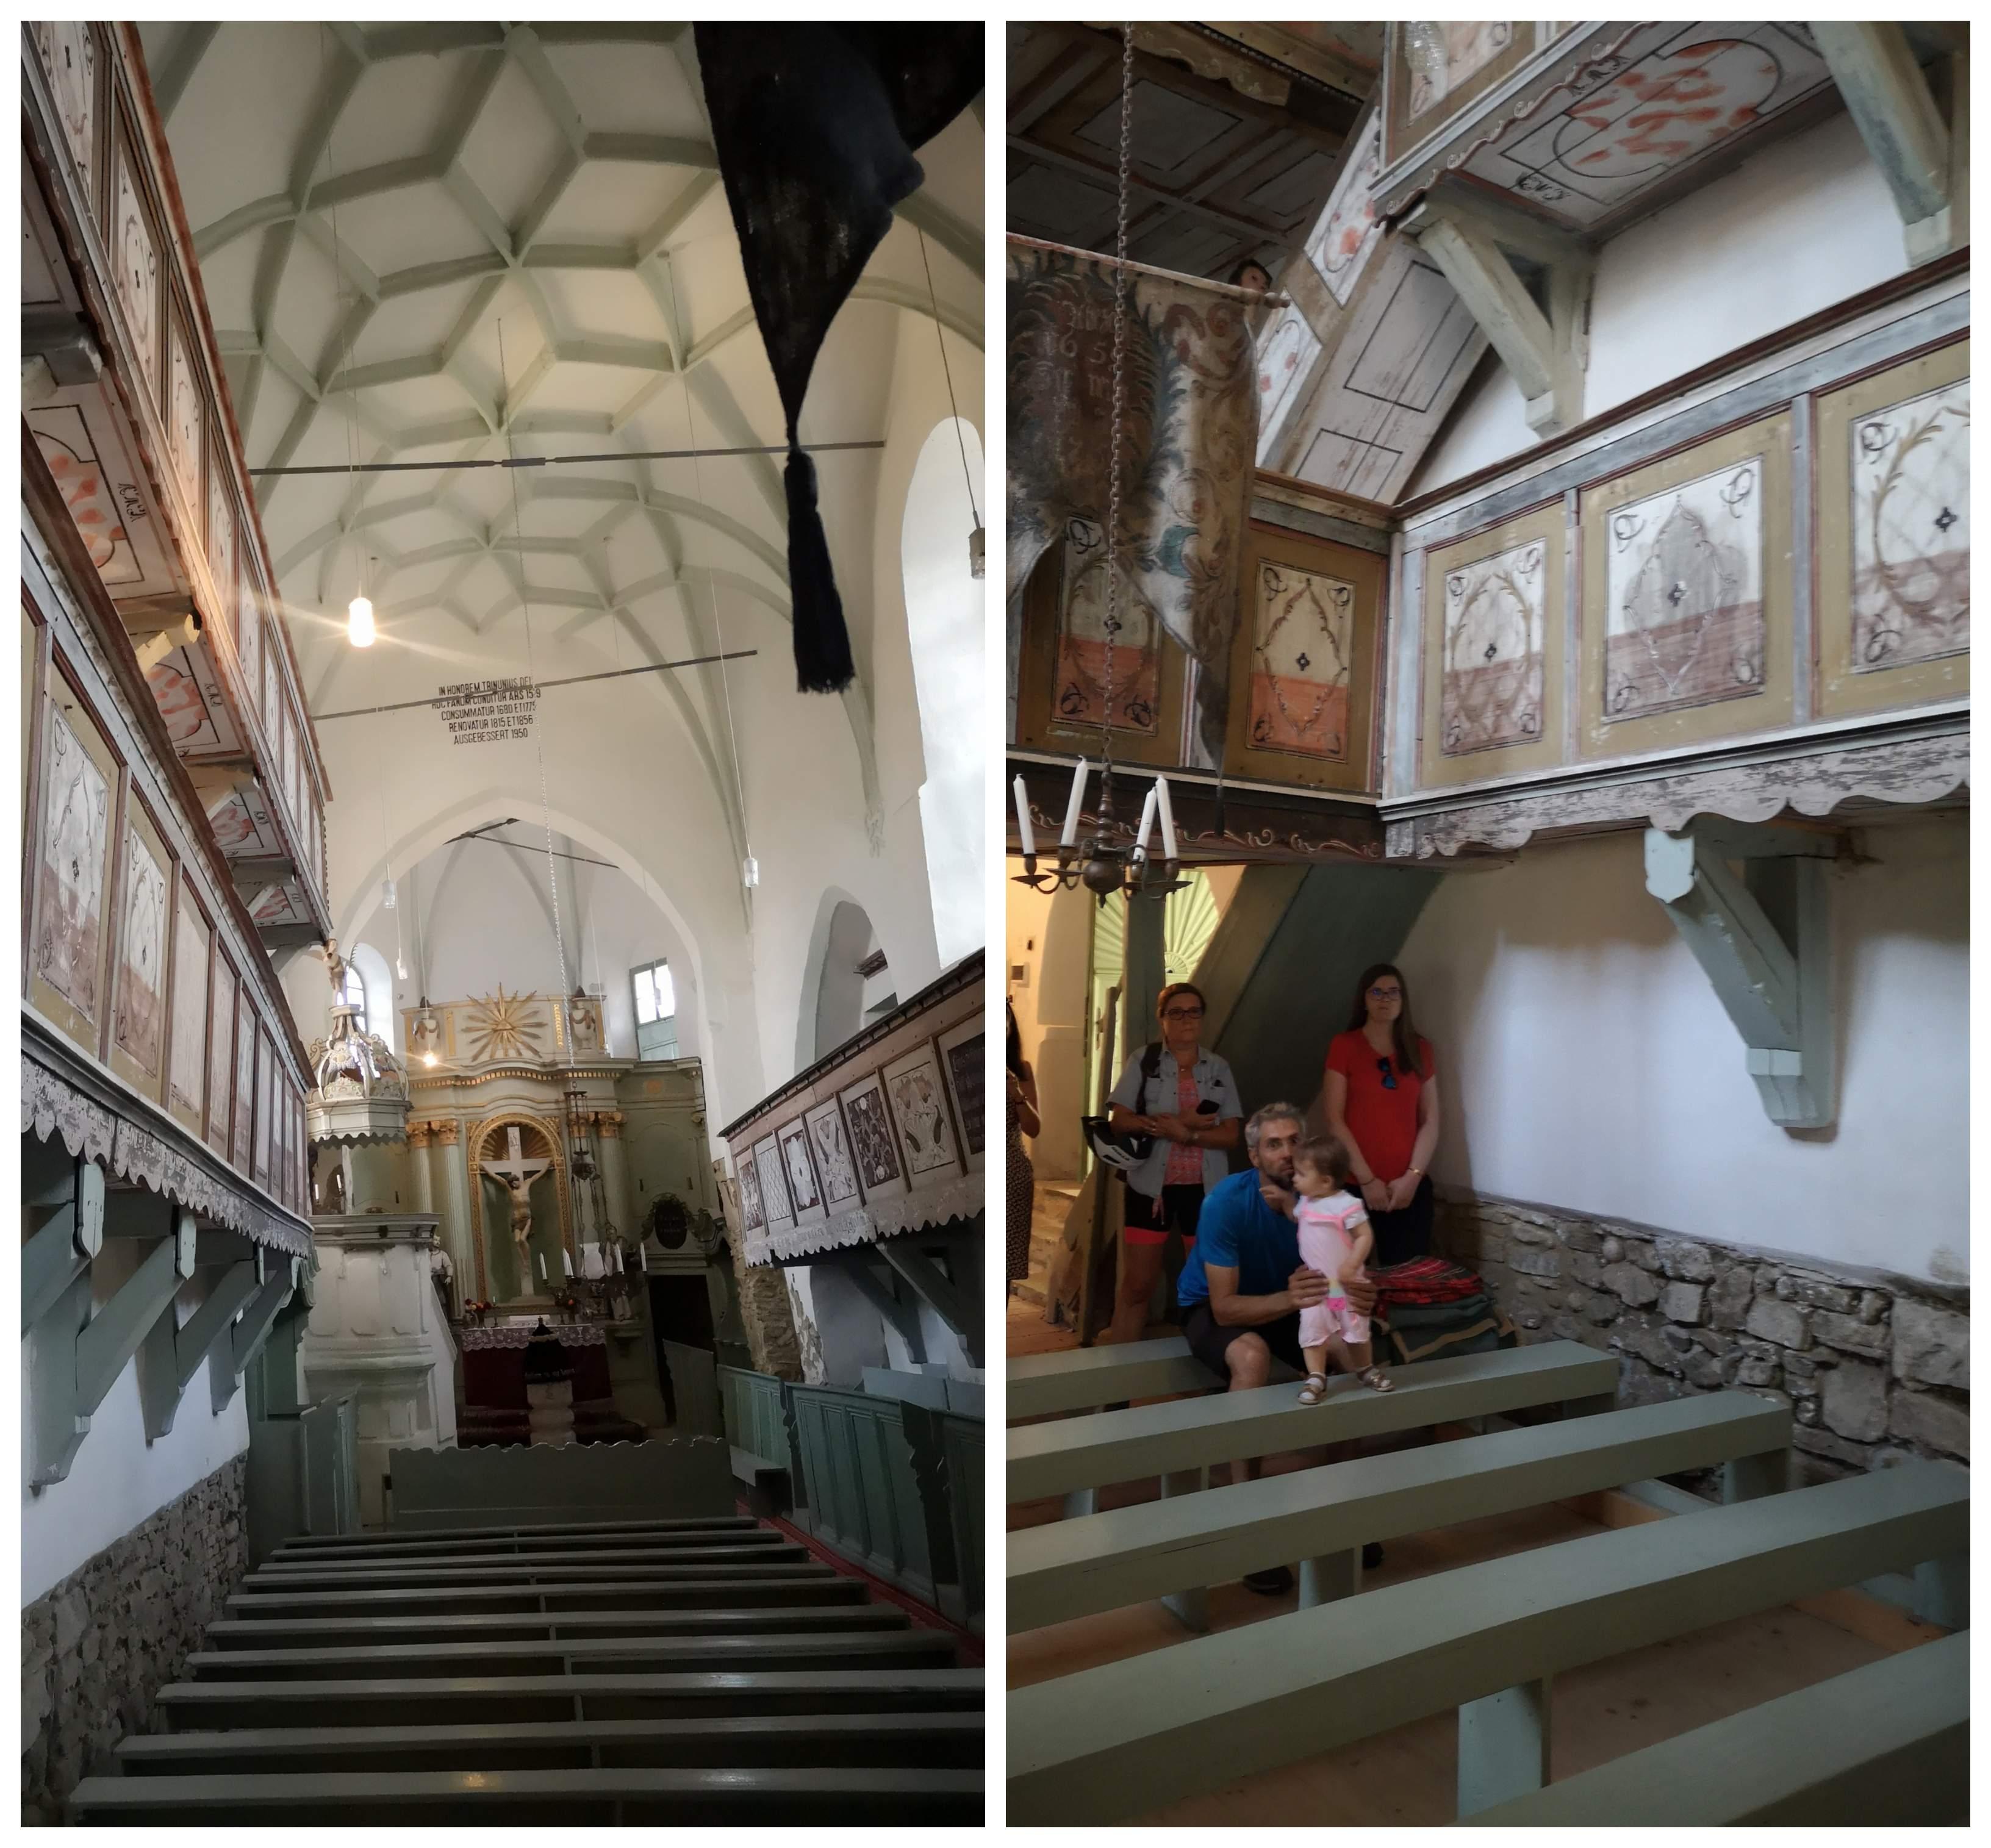 biserica fortificata bunesti probikeaddiction 8